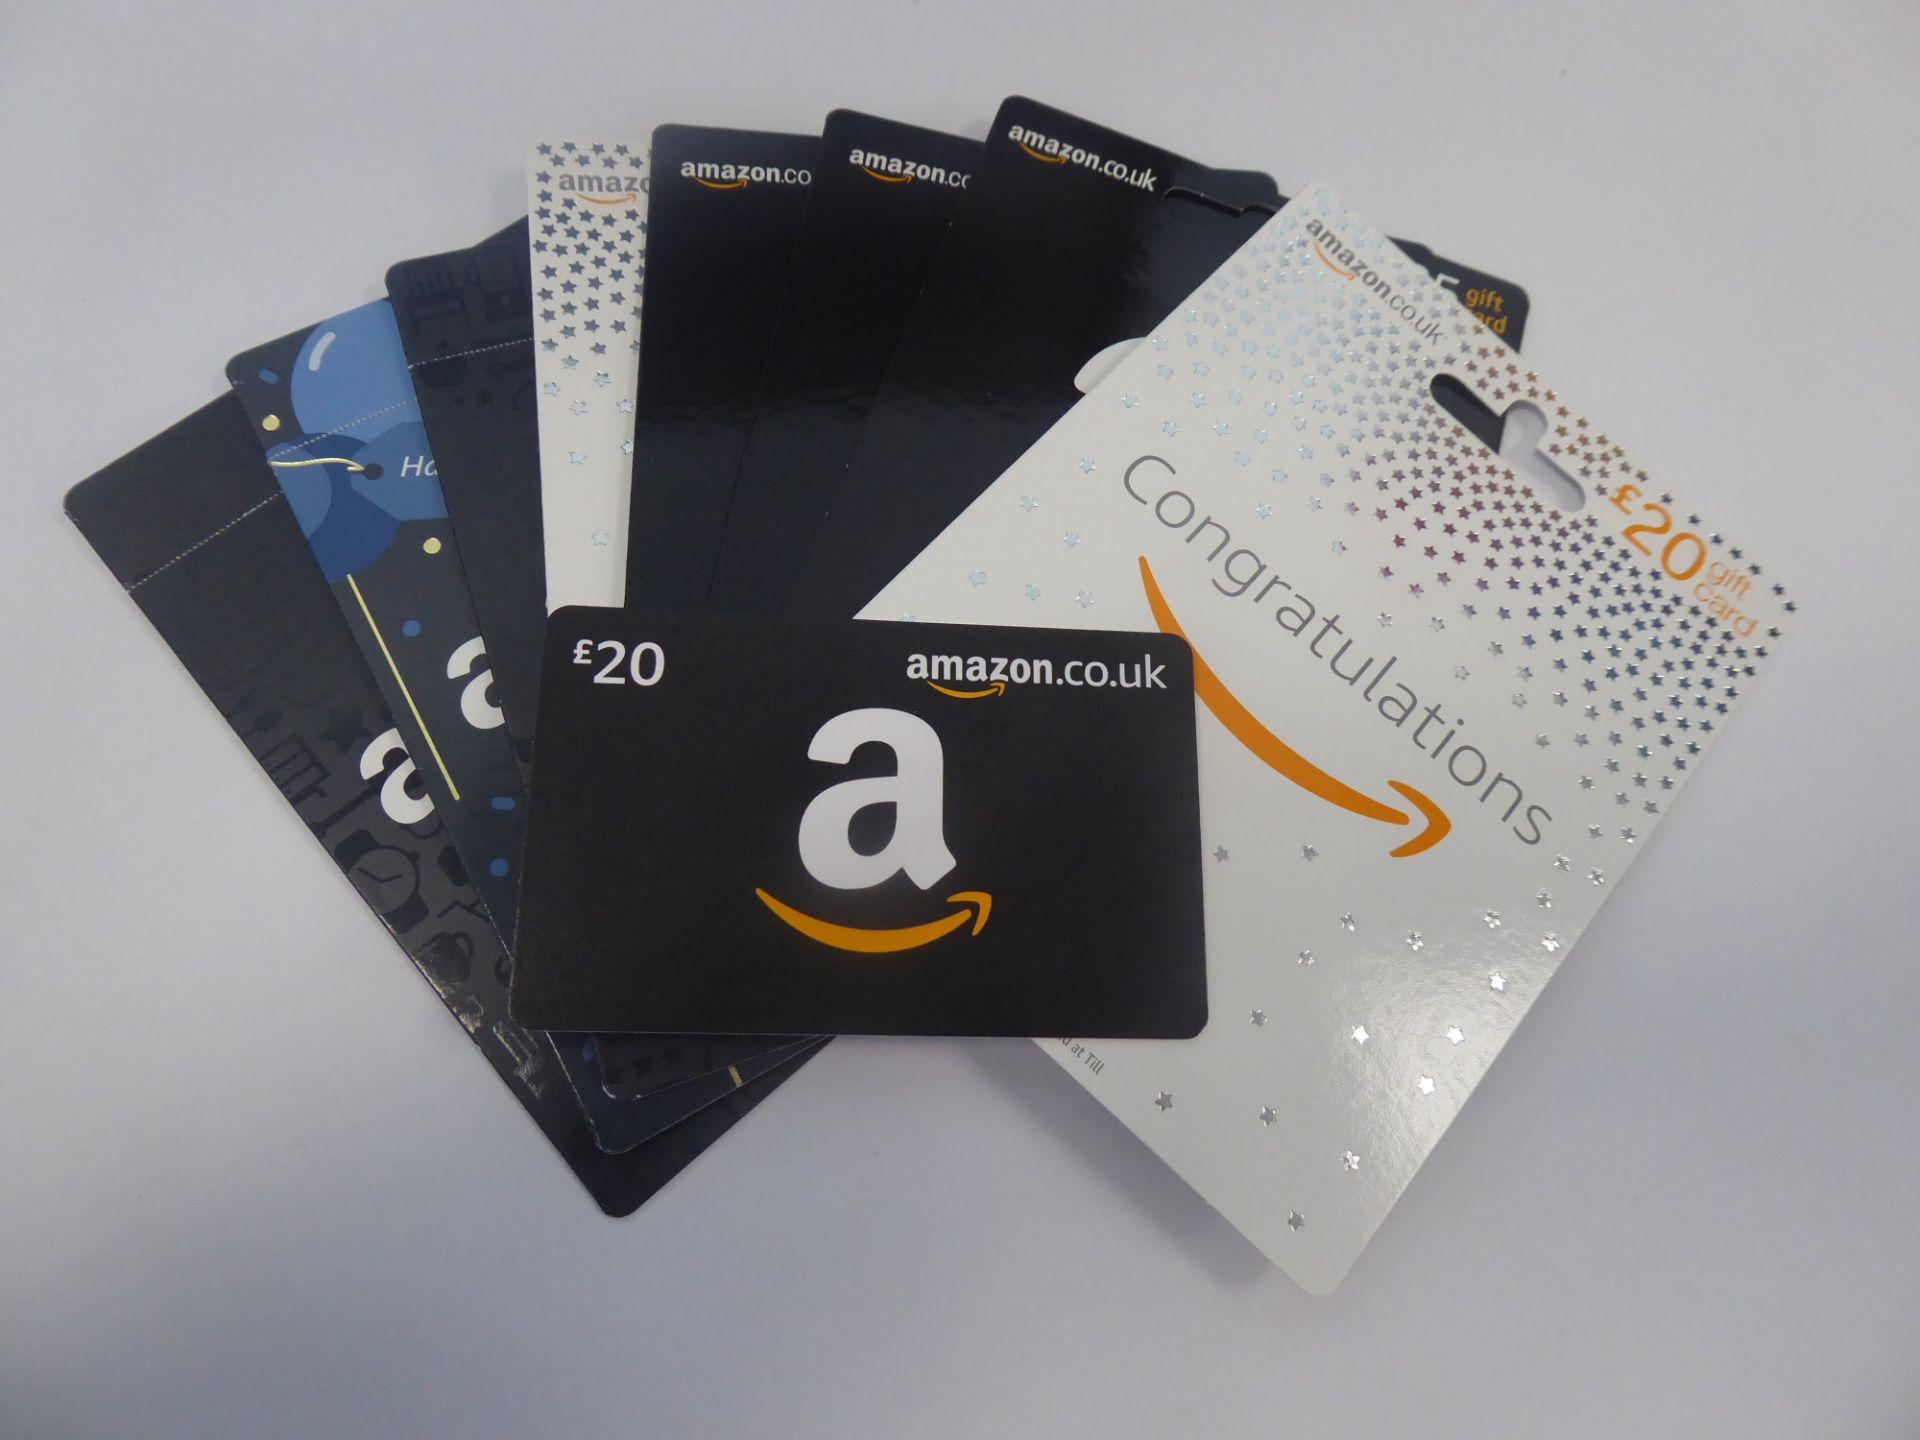 Amazon (x9) - Total face value £185